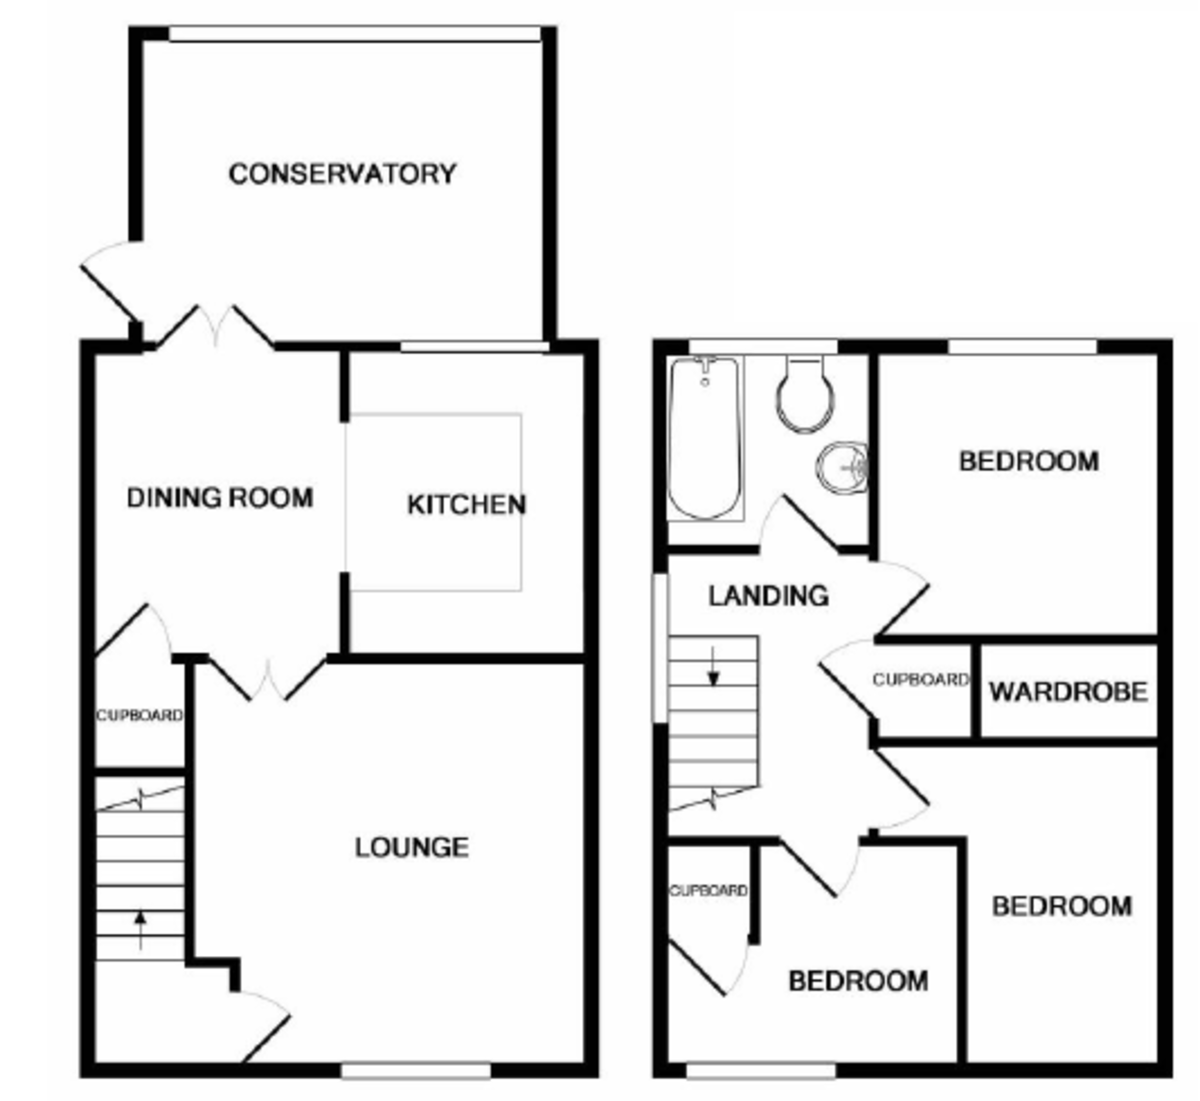 Goldcrest Close, Bingham, NG13 8QQ  Floorplan